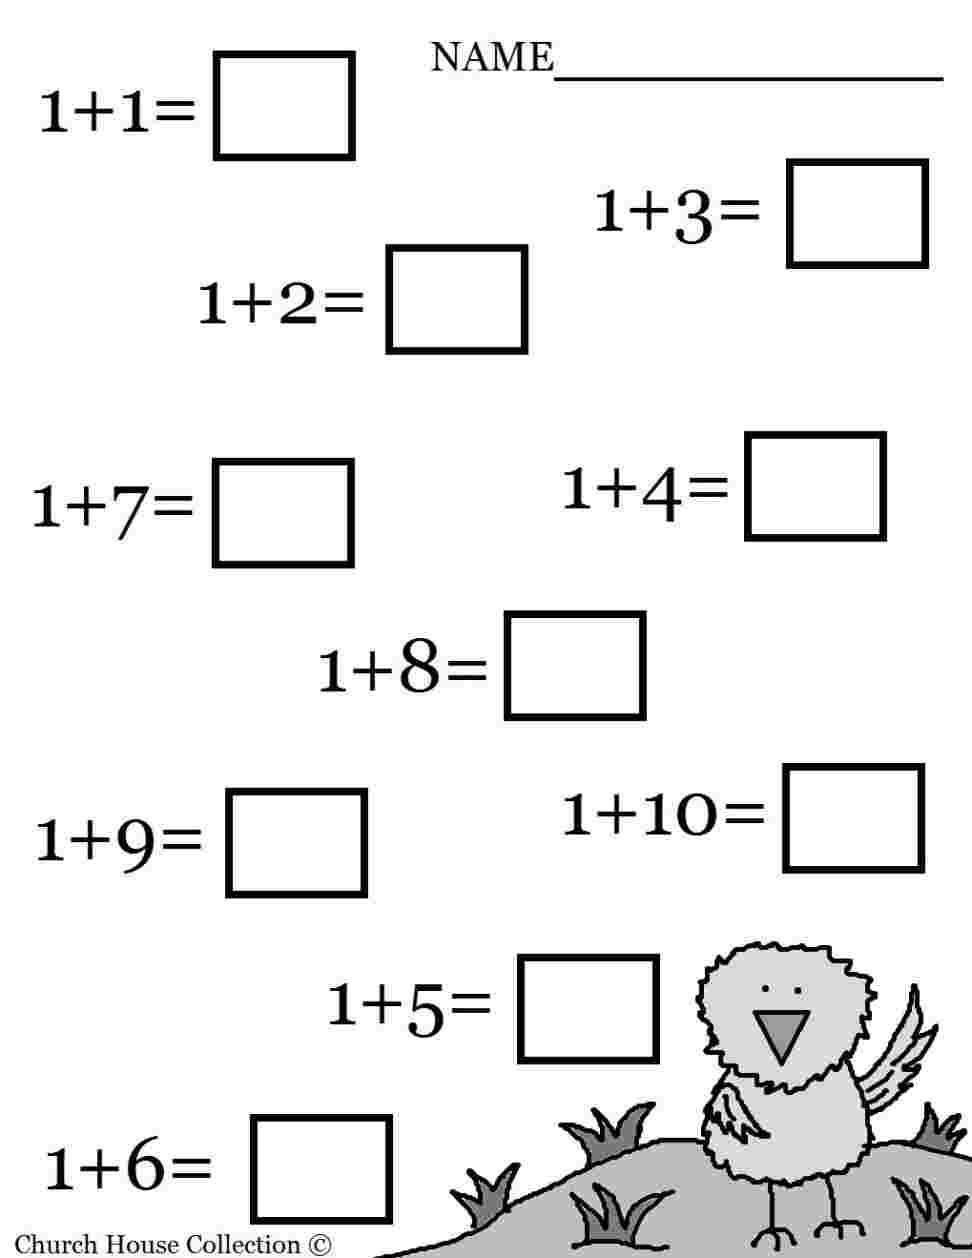 51 Math Worksheets To Print Math Worksheets Fun Math Worksheets Learning Worksheets